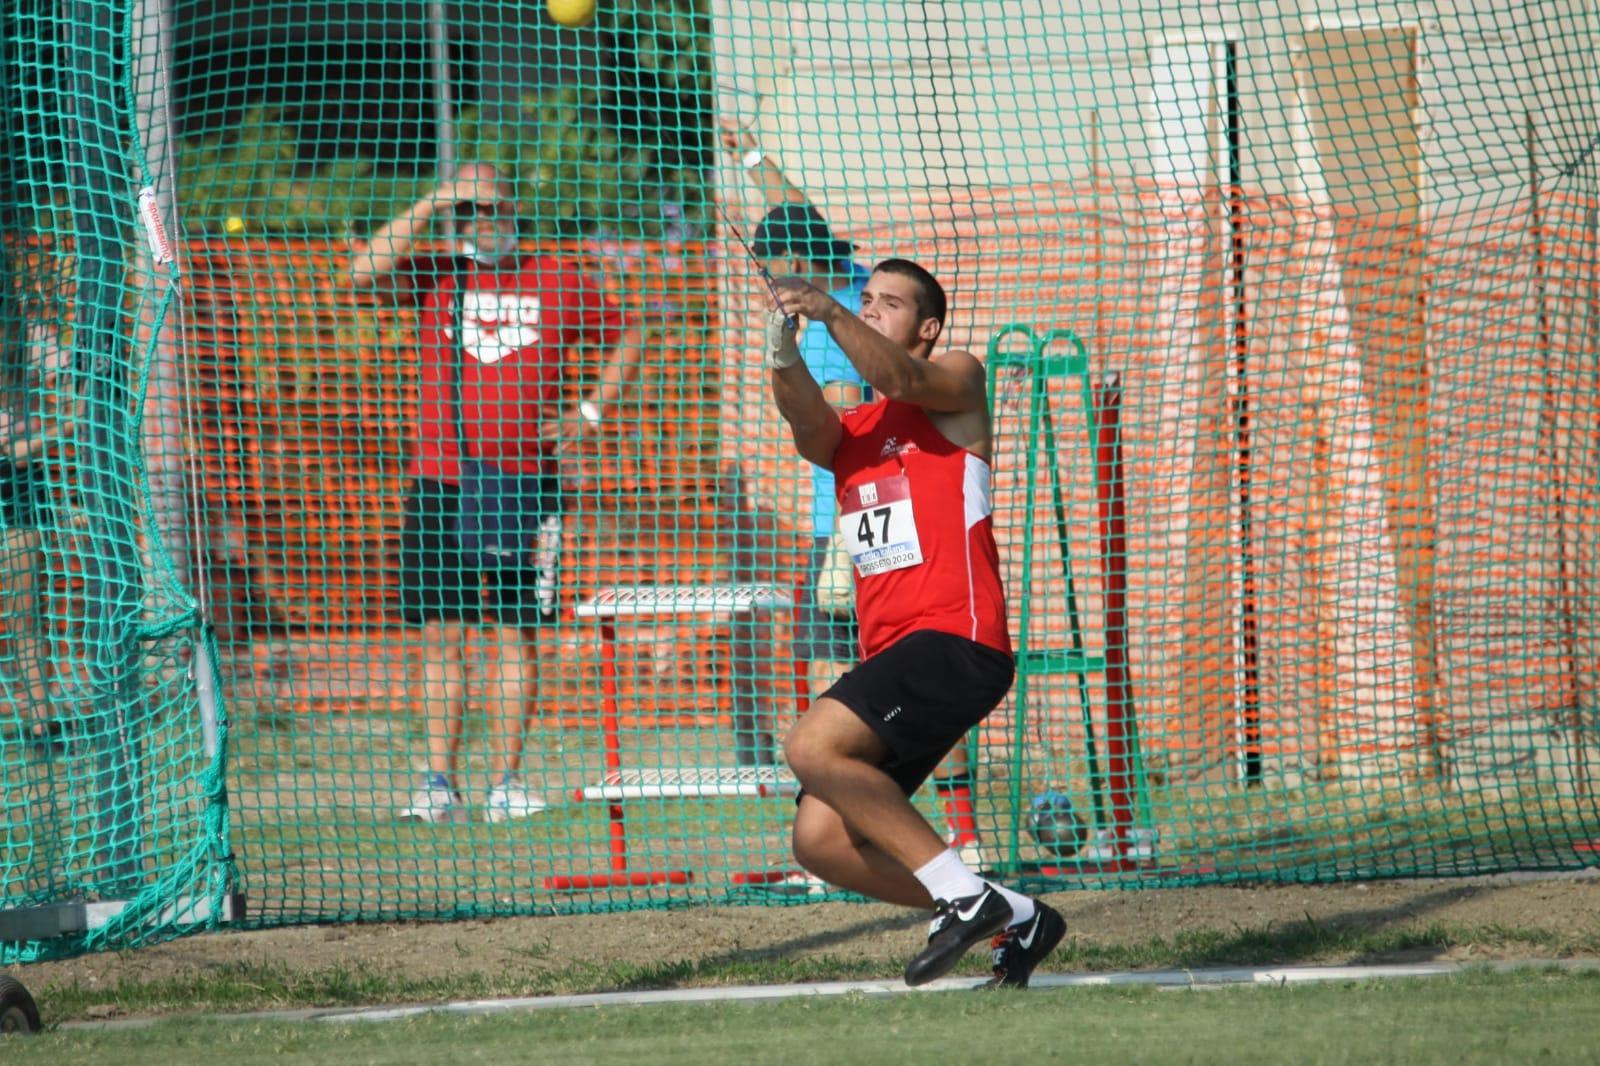 atletica-Lorenzo-Bigazzi martello